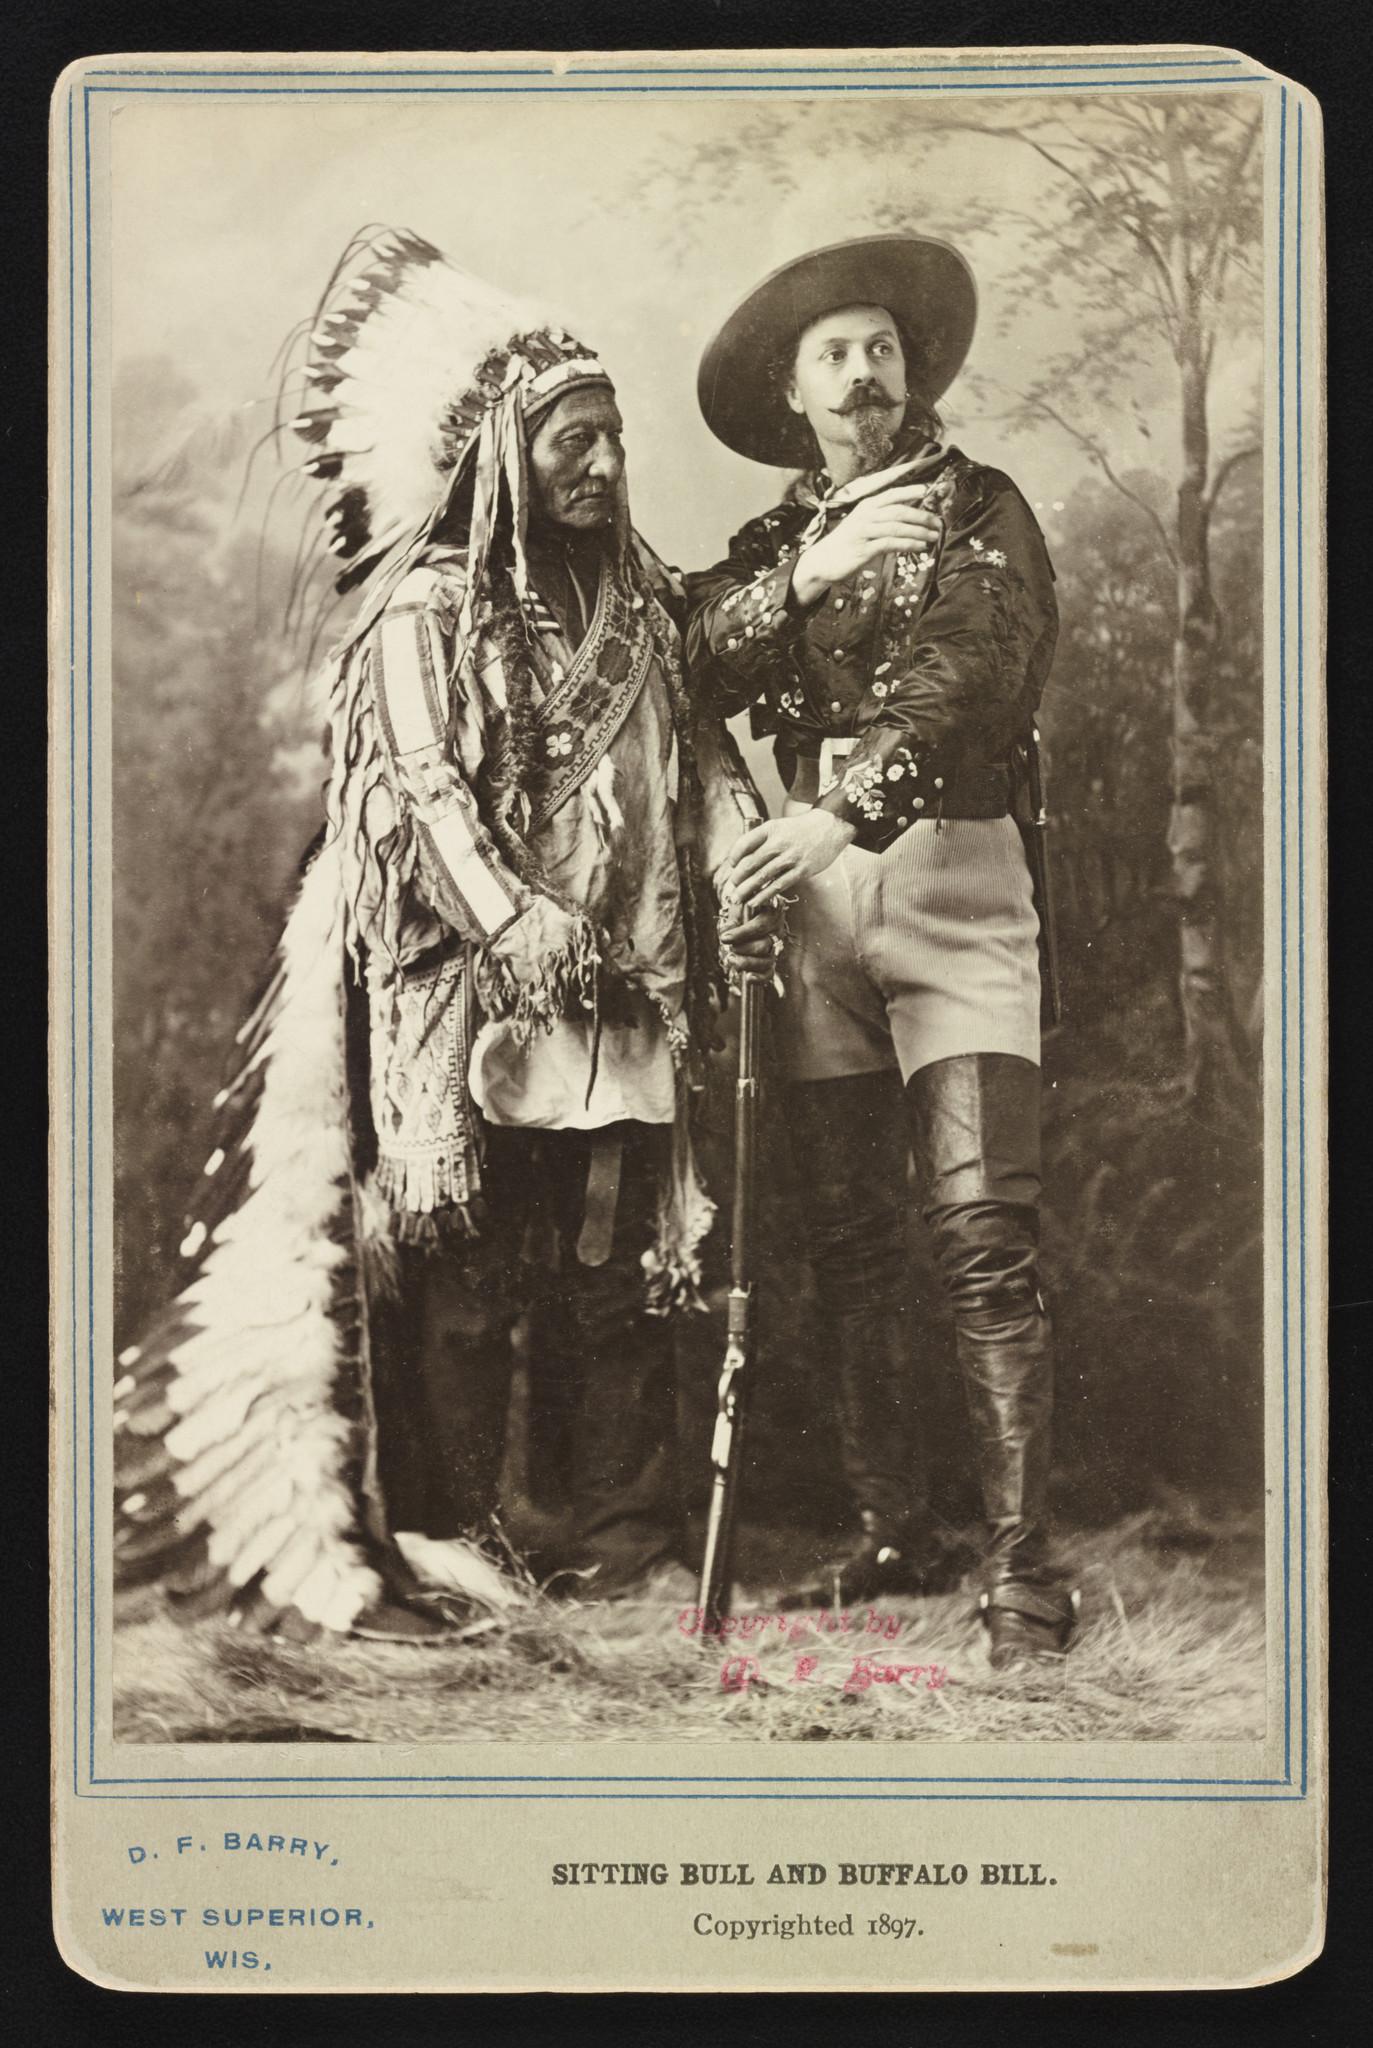 Sitting Bull and Buffalo Bill